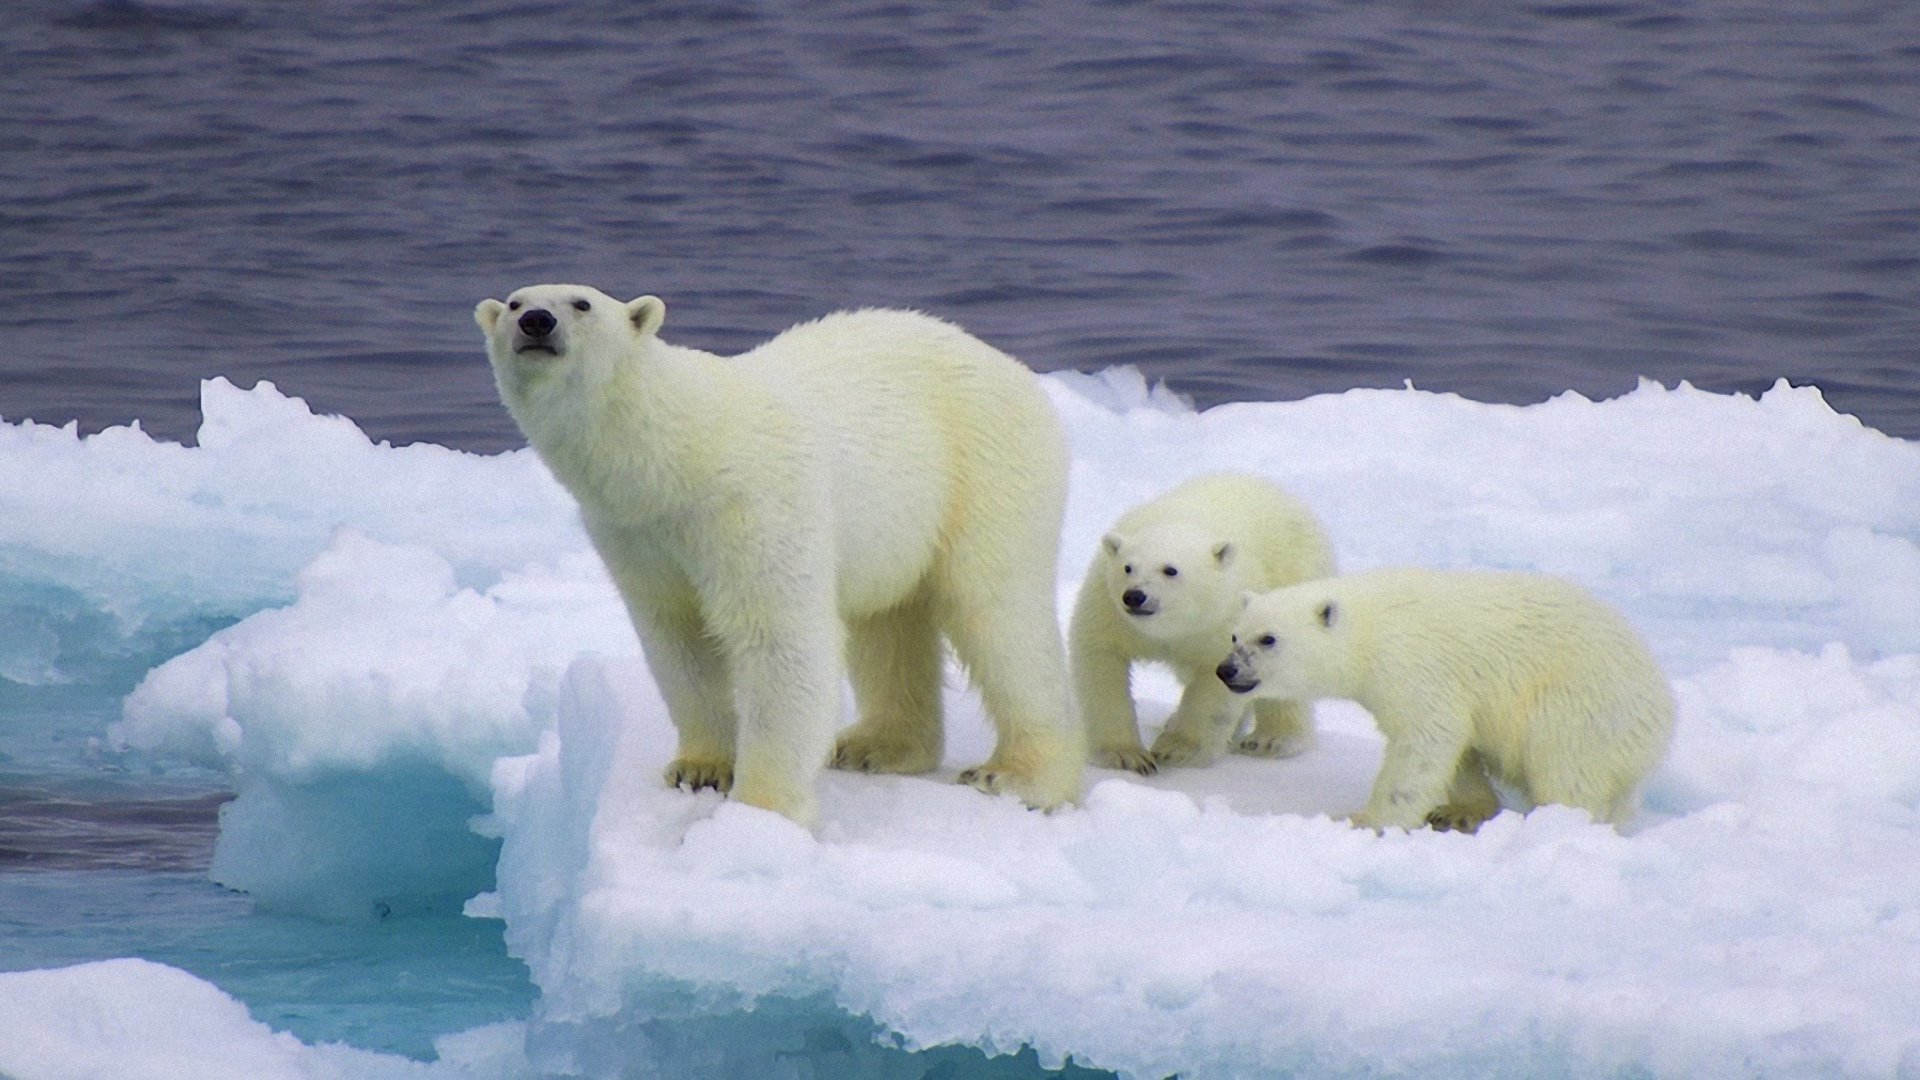 And Cubs On Iceberg 1920x1080 wallpaper1920X1080 wallpaper screensaver 1920x1080